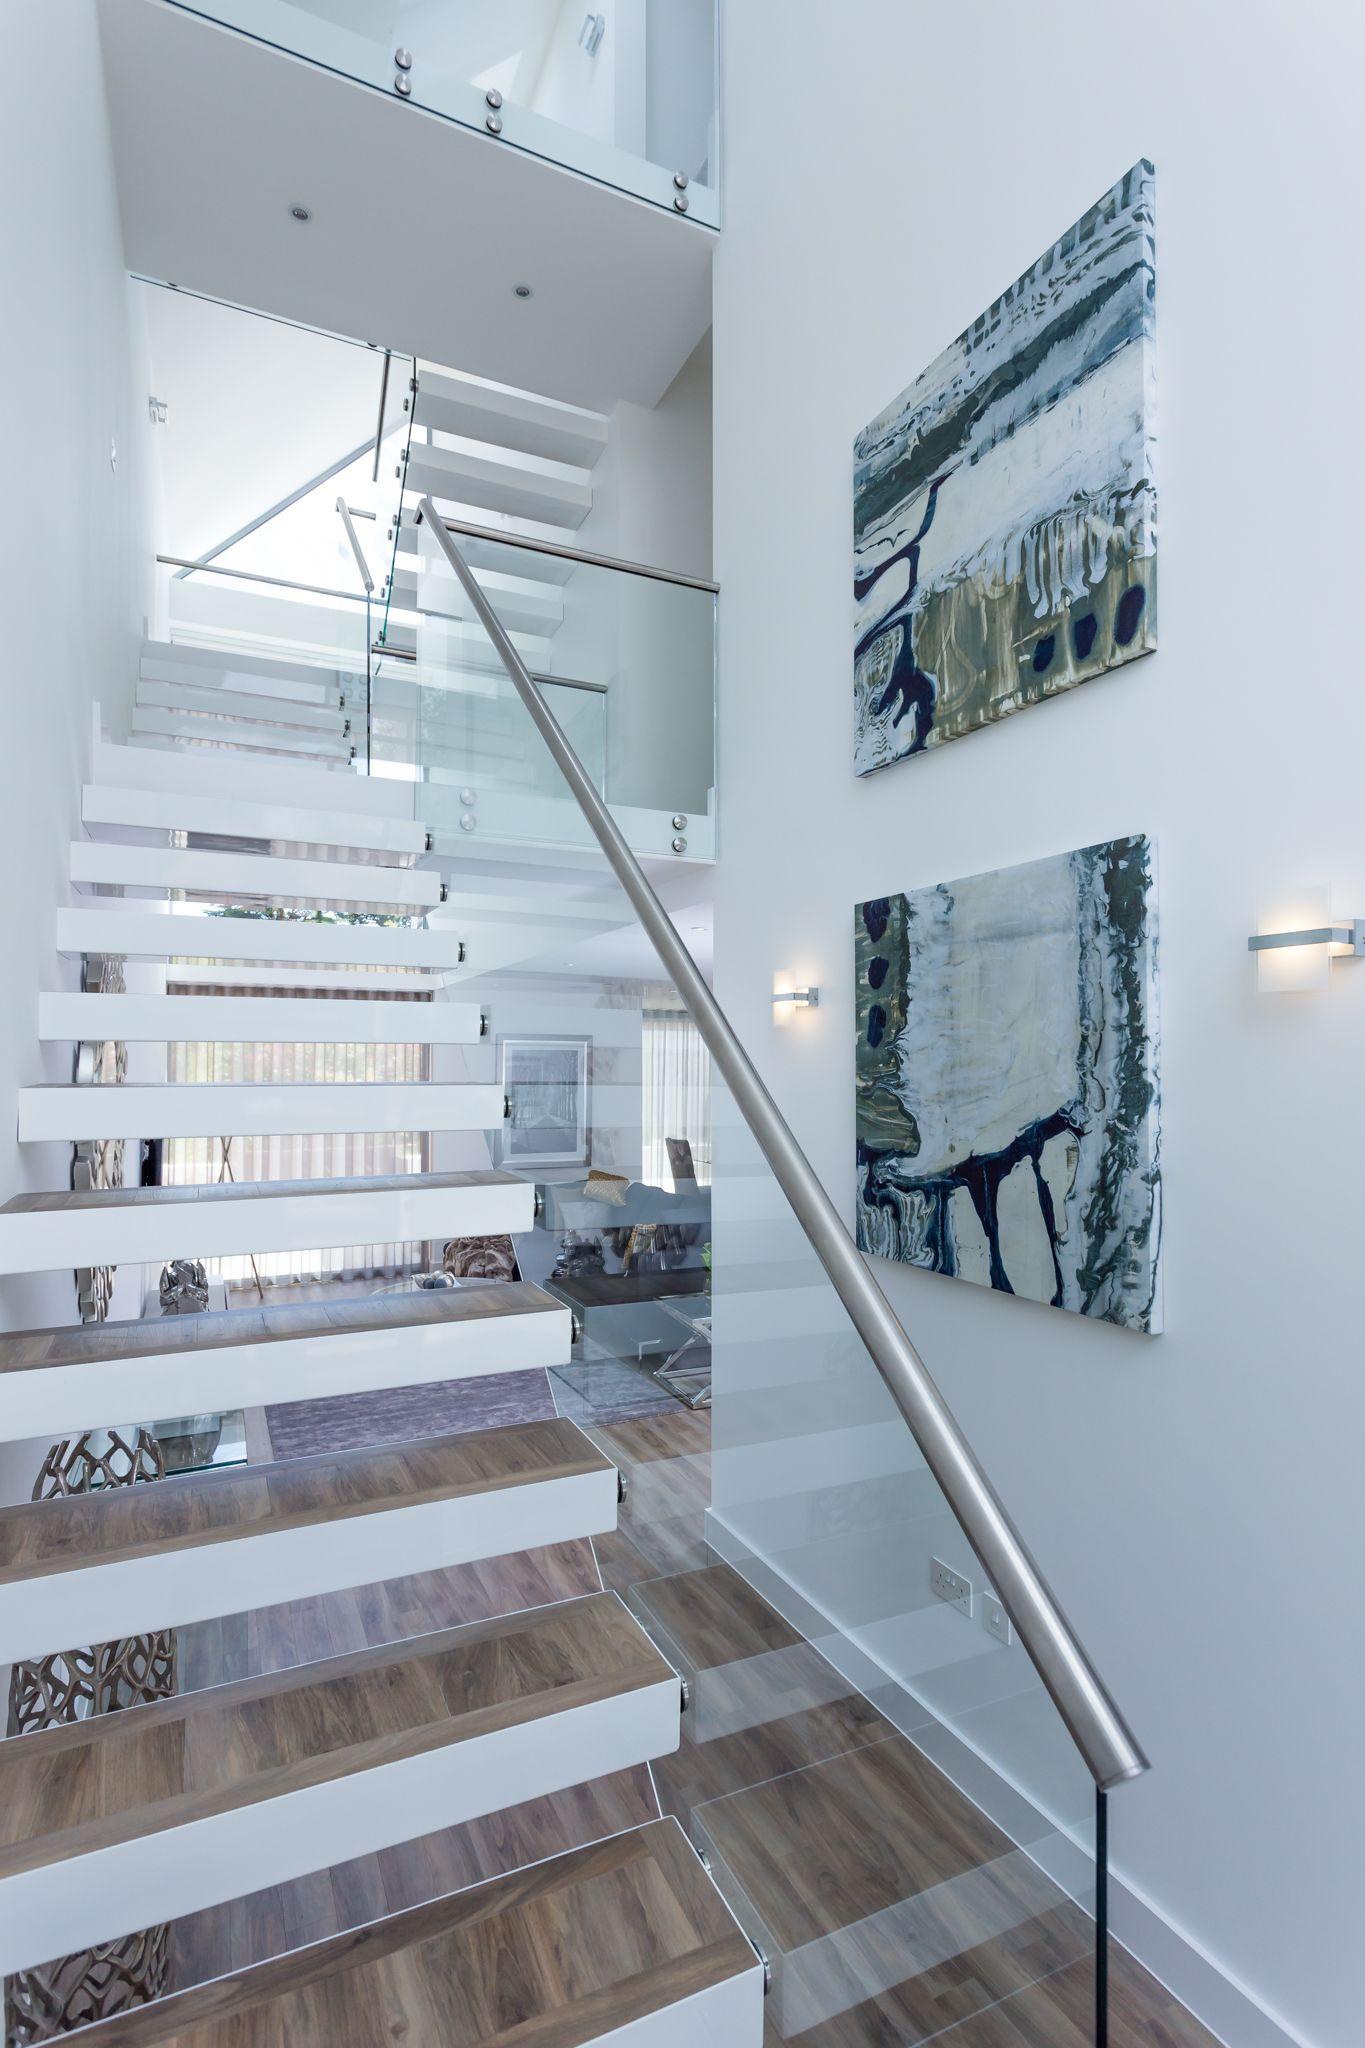 Styling By Smb Interior Design Bournemouth Interior Design